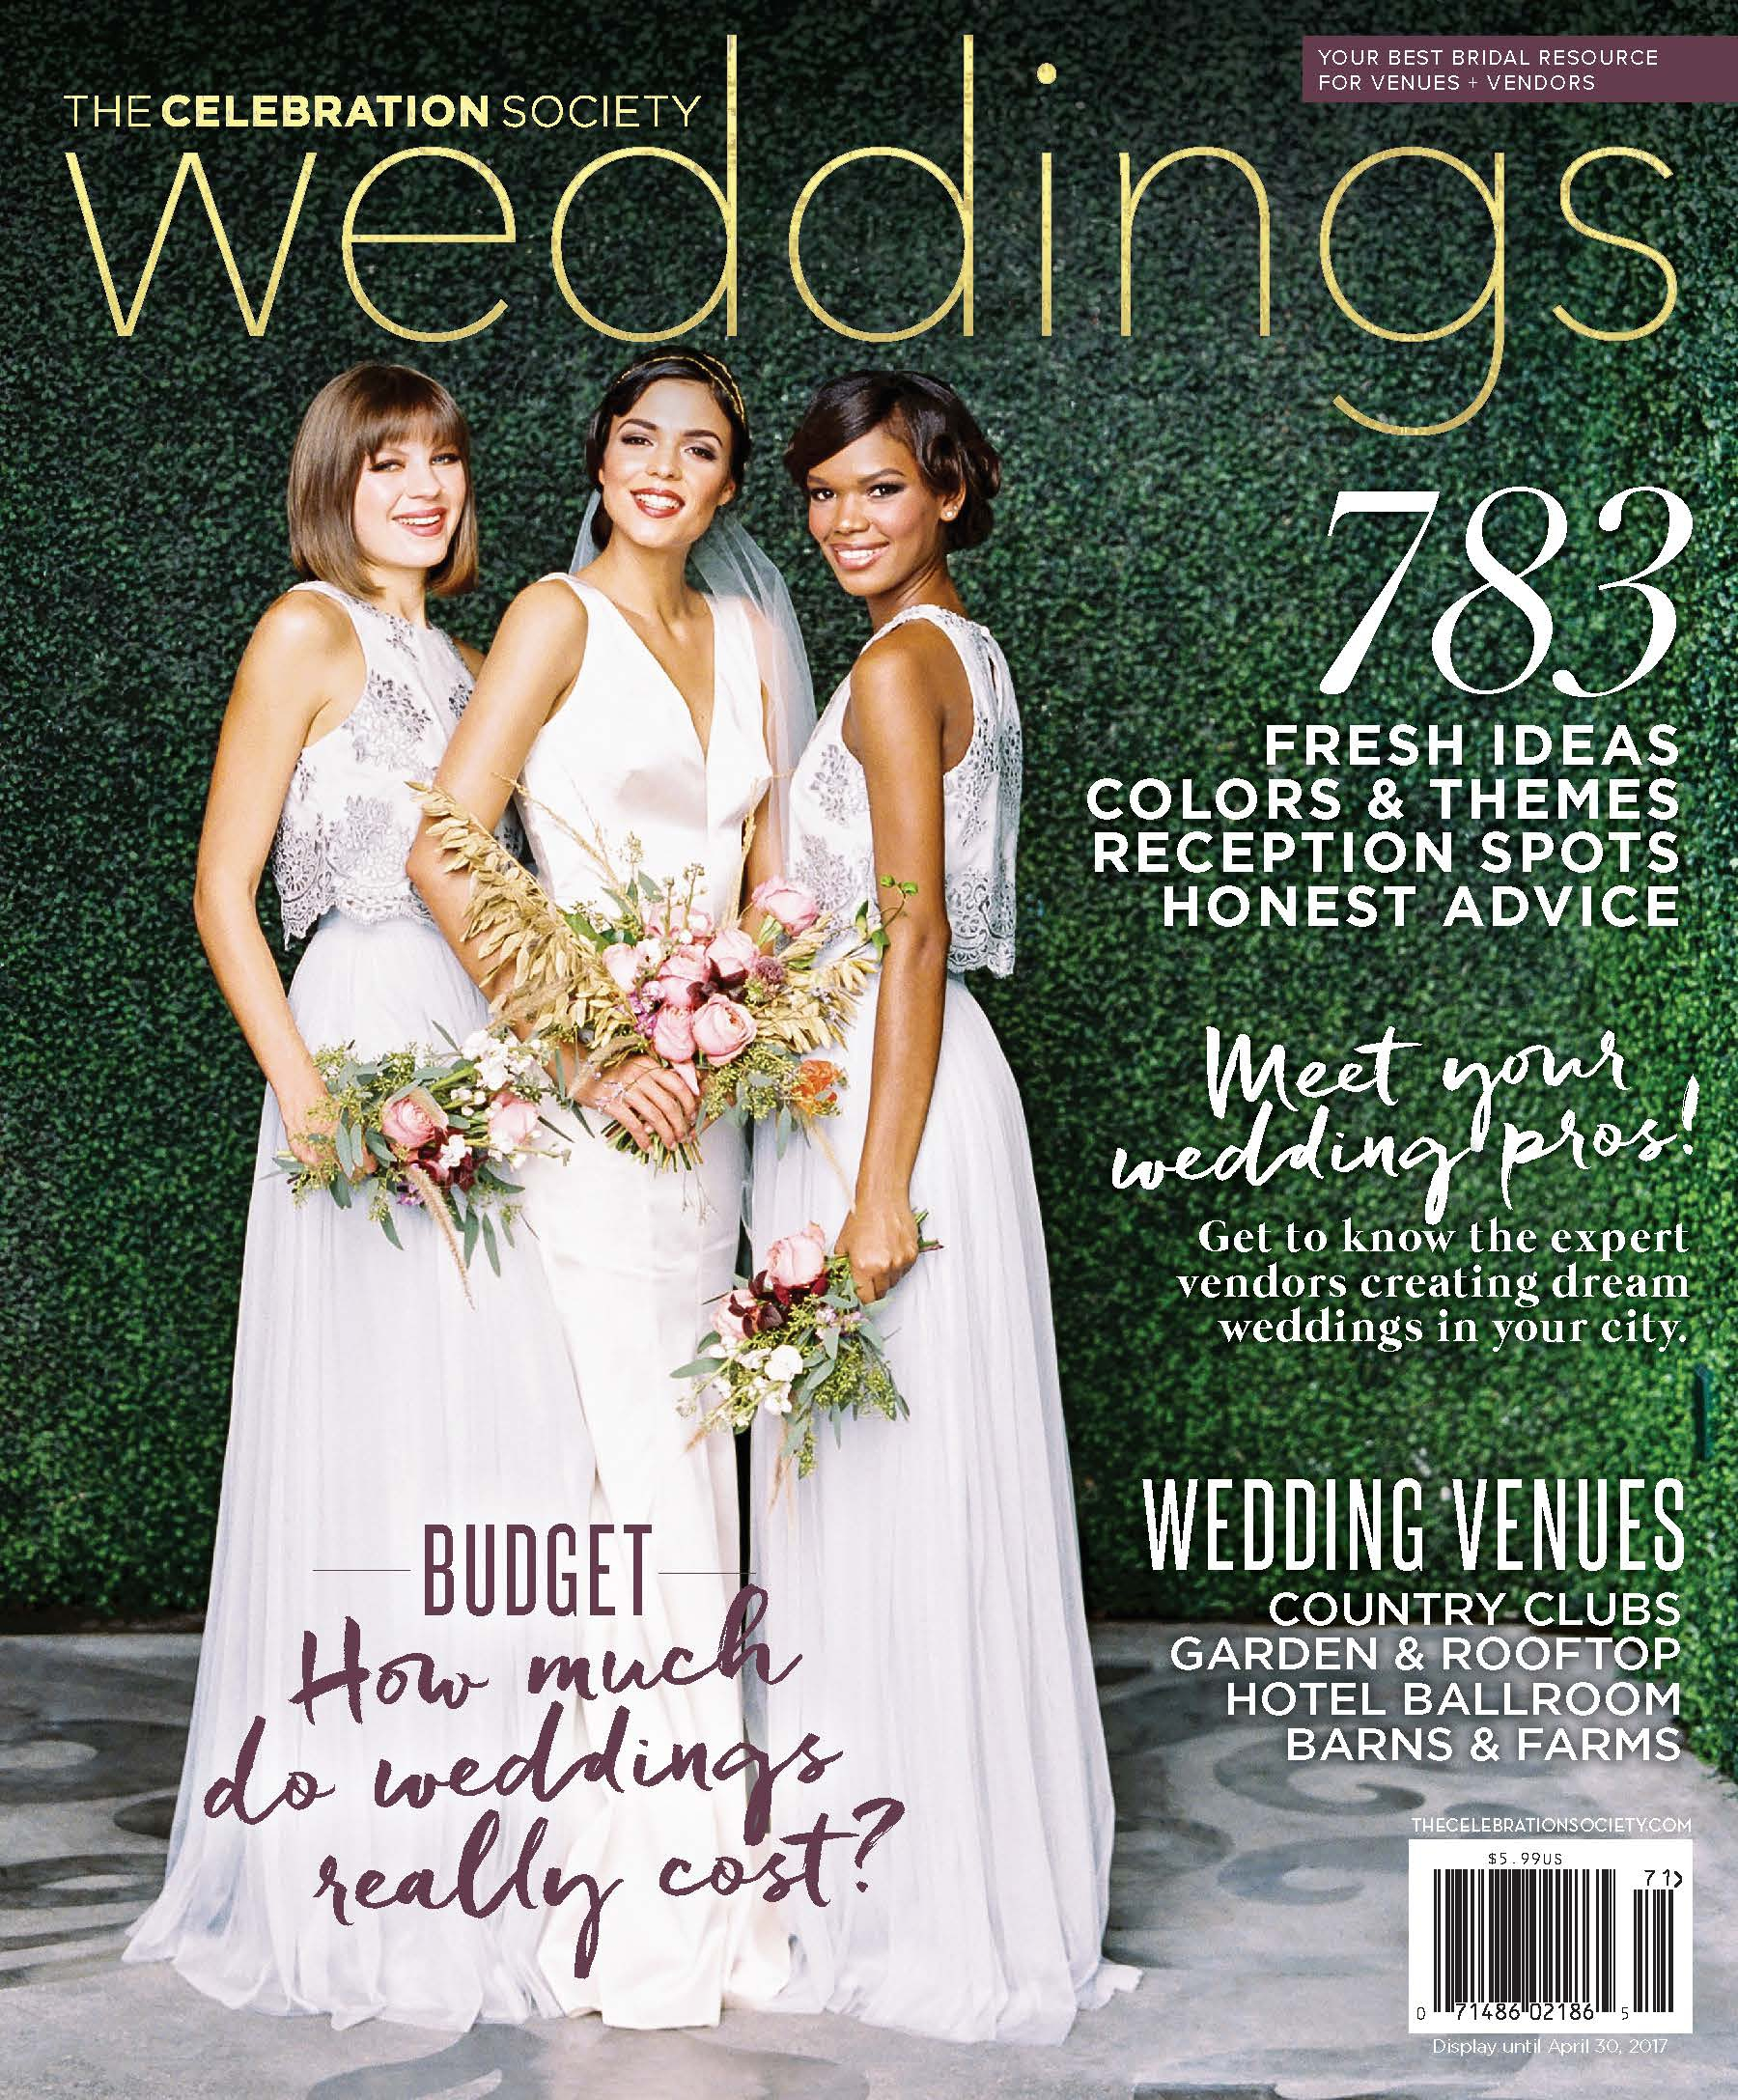 The Celebration Society weddings 2017 issue